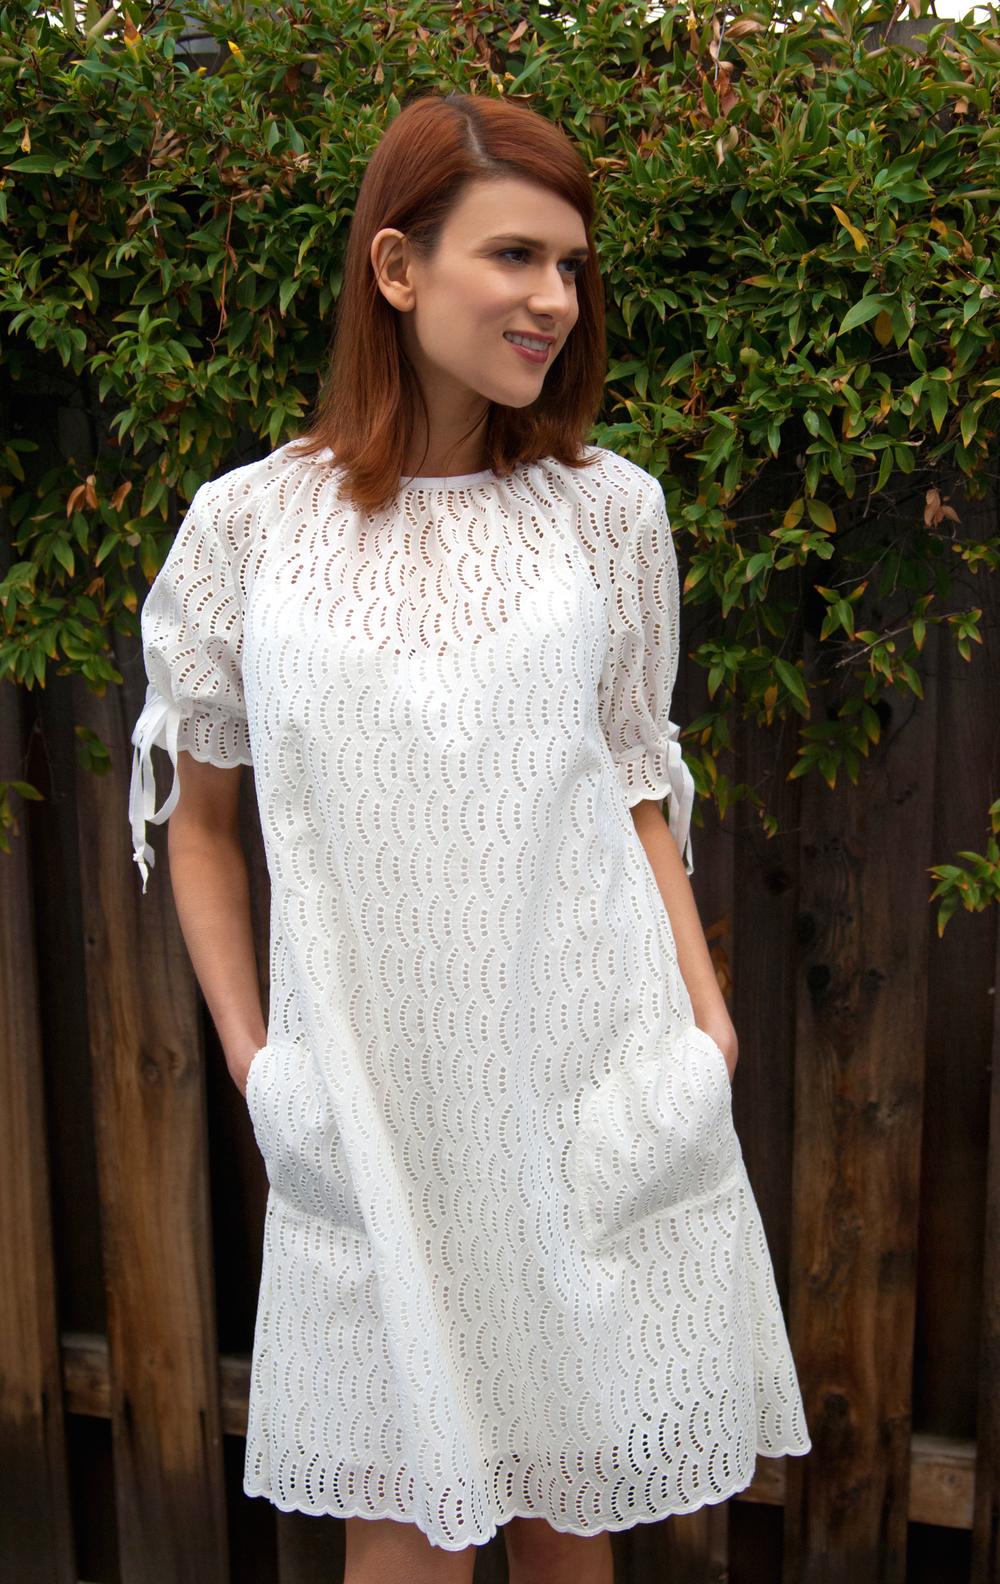 A-Line Shift Dress with Pockets